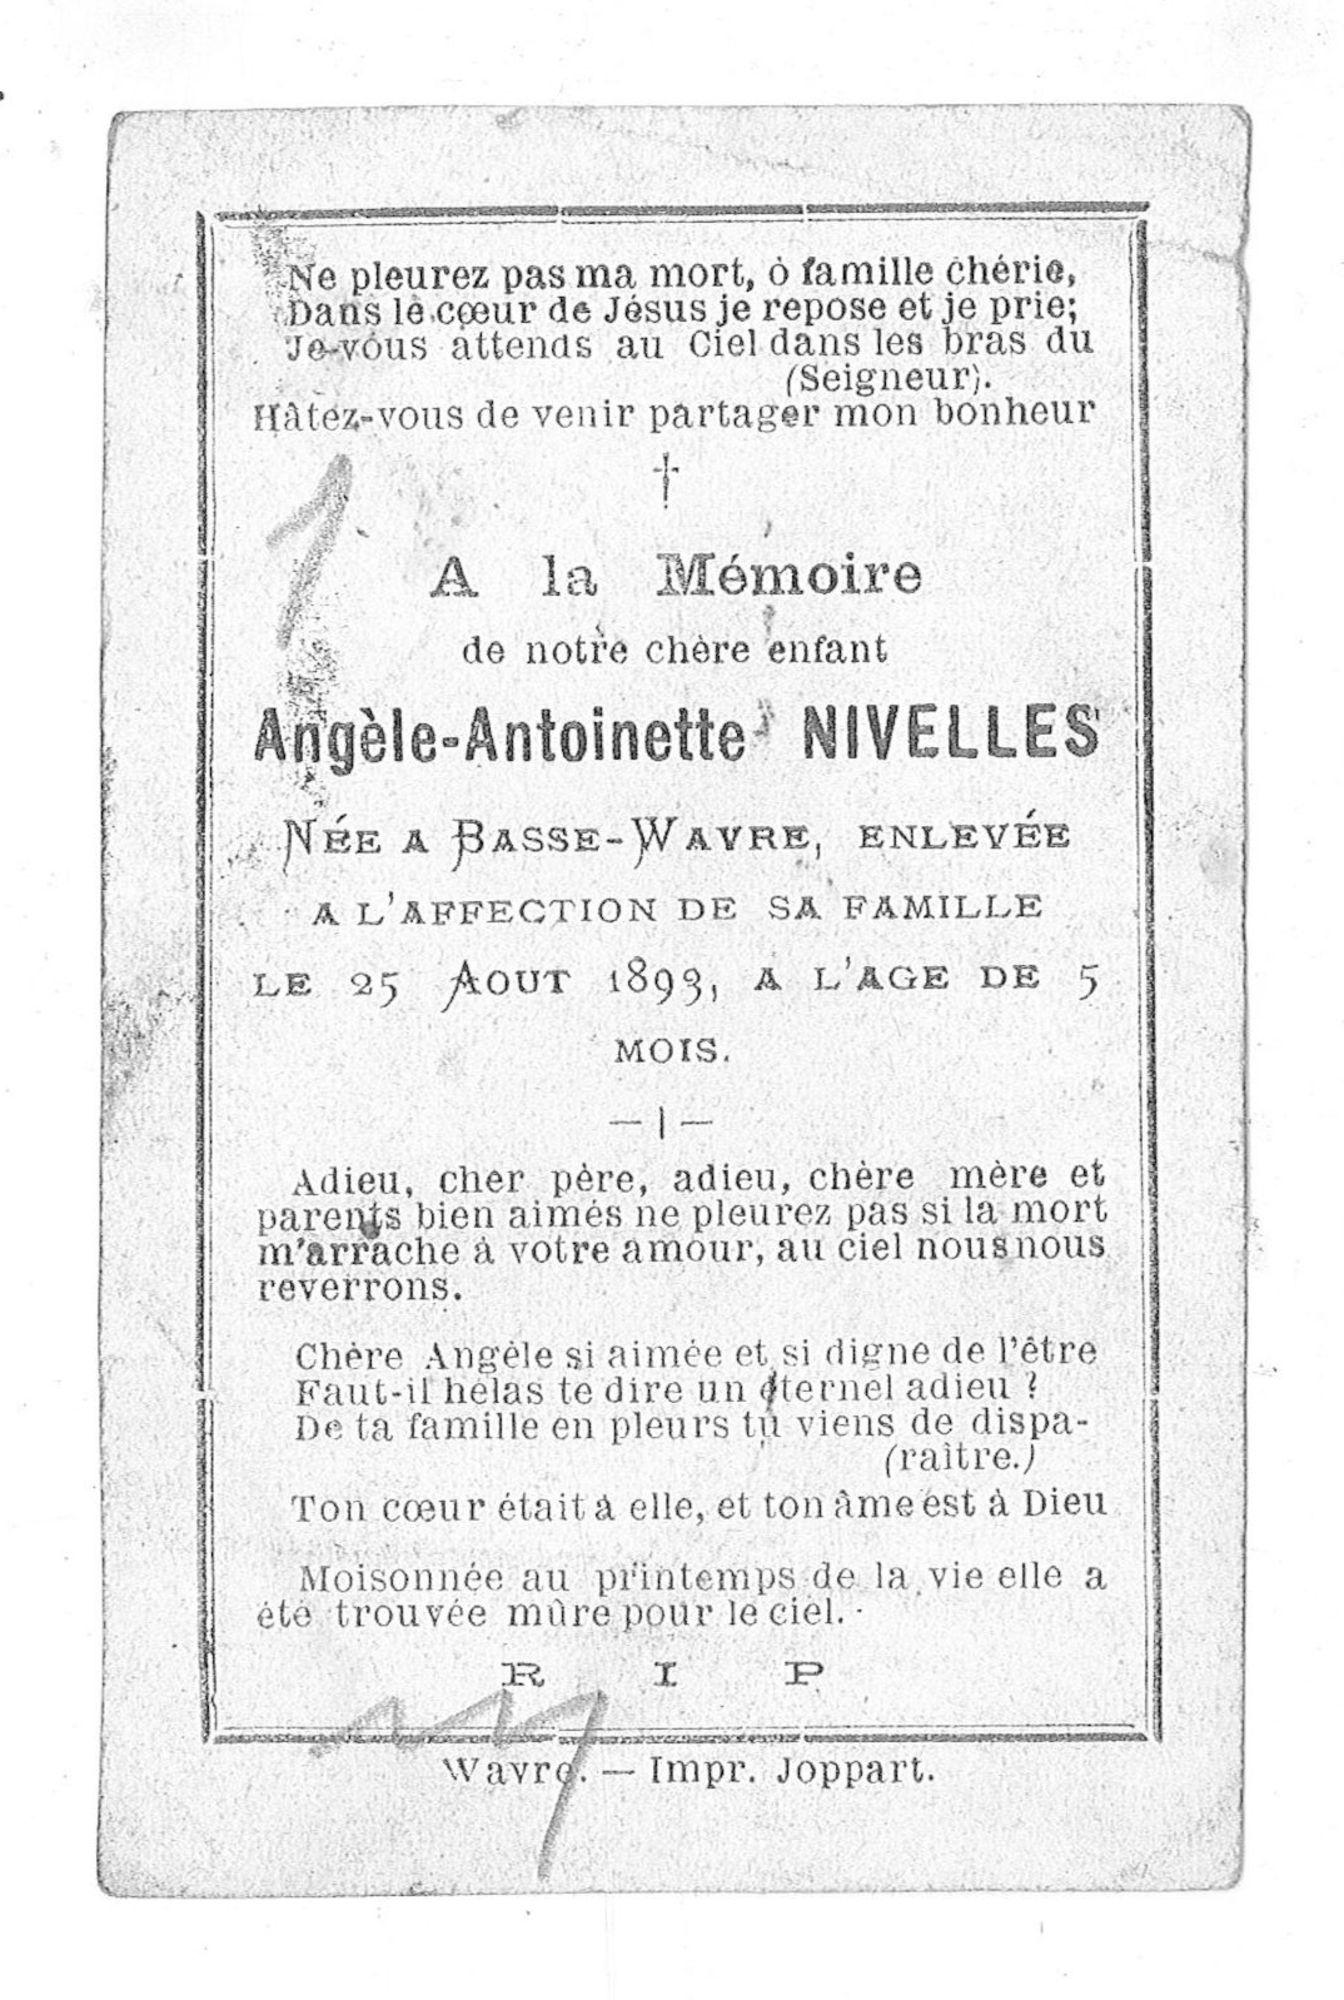 Angèle-Antoinette Nivelles